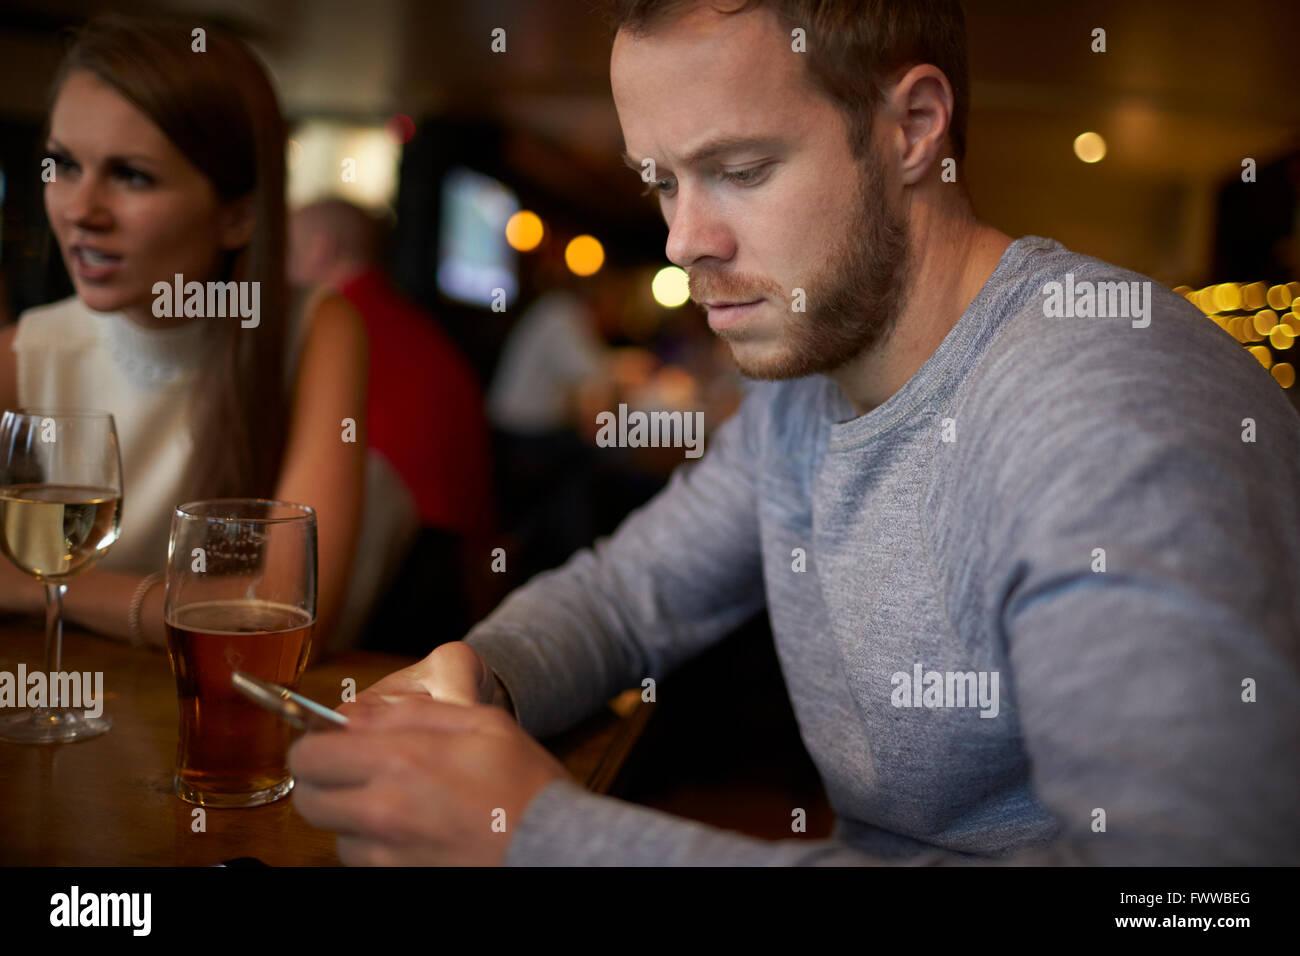 Hombre joven sentado en la Barra Enviar mensaje de texto Imagen De Stock